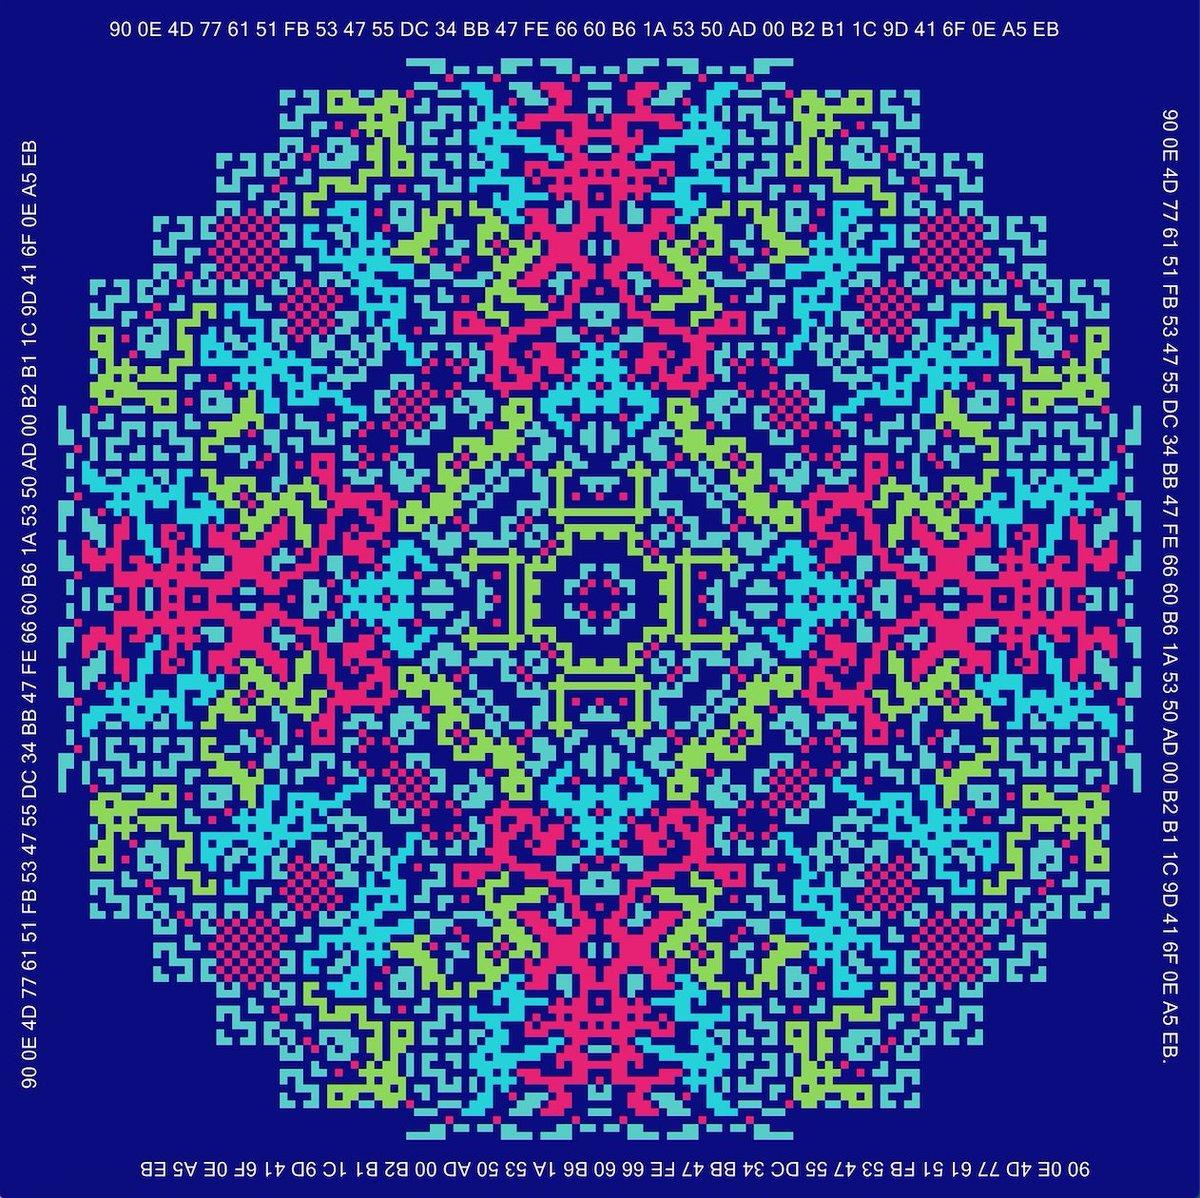 Happy home! Happy me! Happy year!  #generative #creative #art #mandala #concept #opticalart #ornament #visualart #contemporary #experimentalart #interiordesign #cool #society6 #meditation #style #design #decoration #wallart #pattern